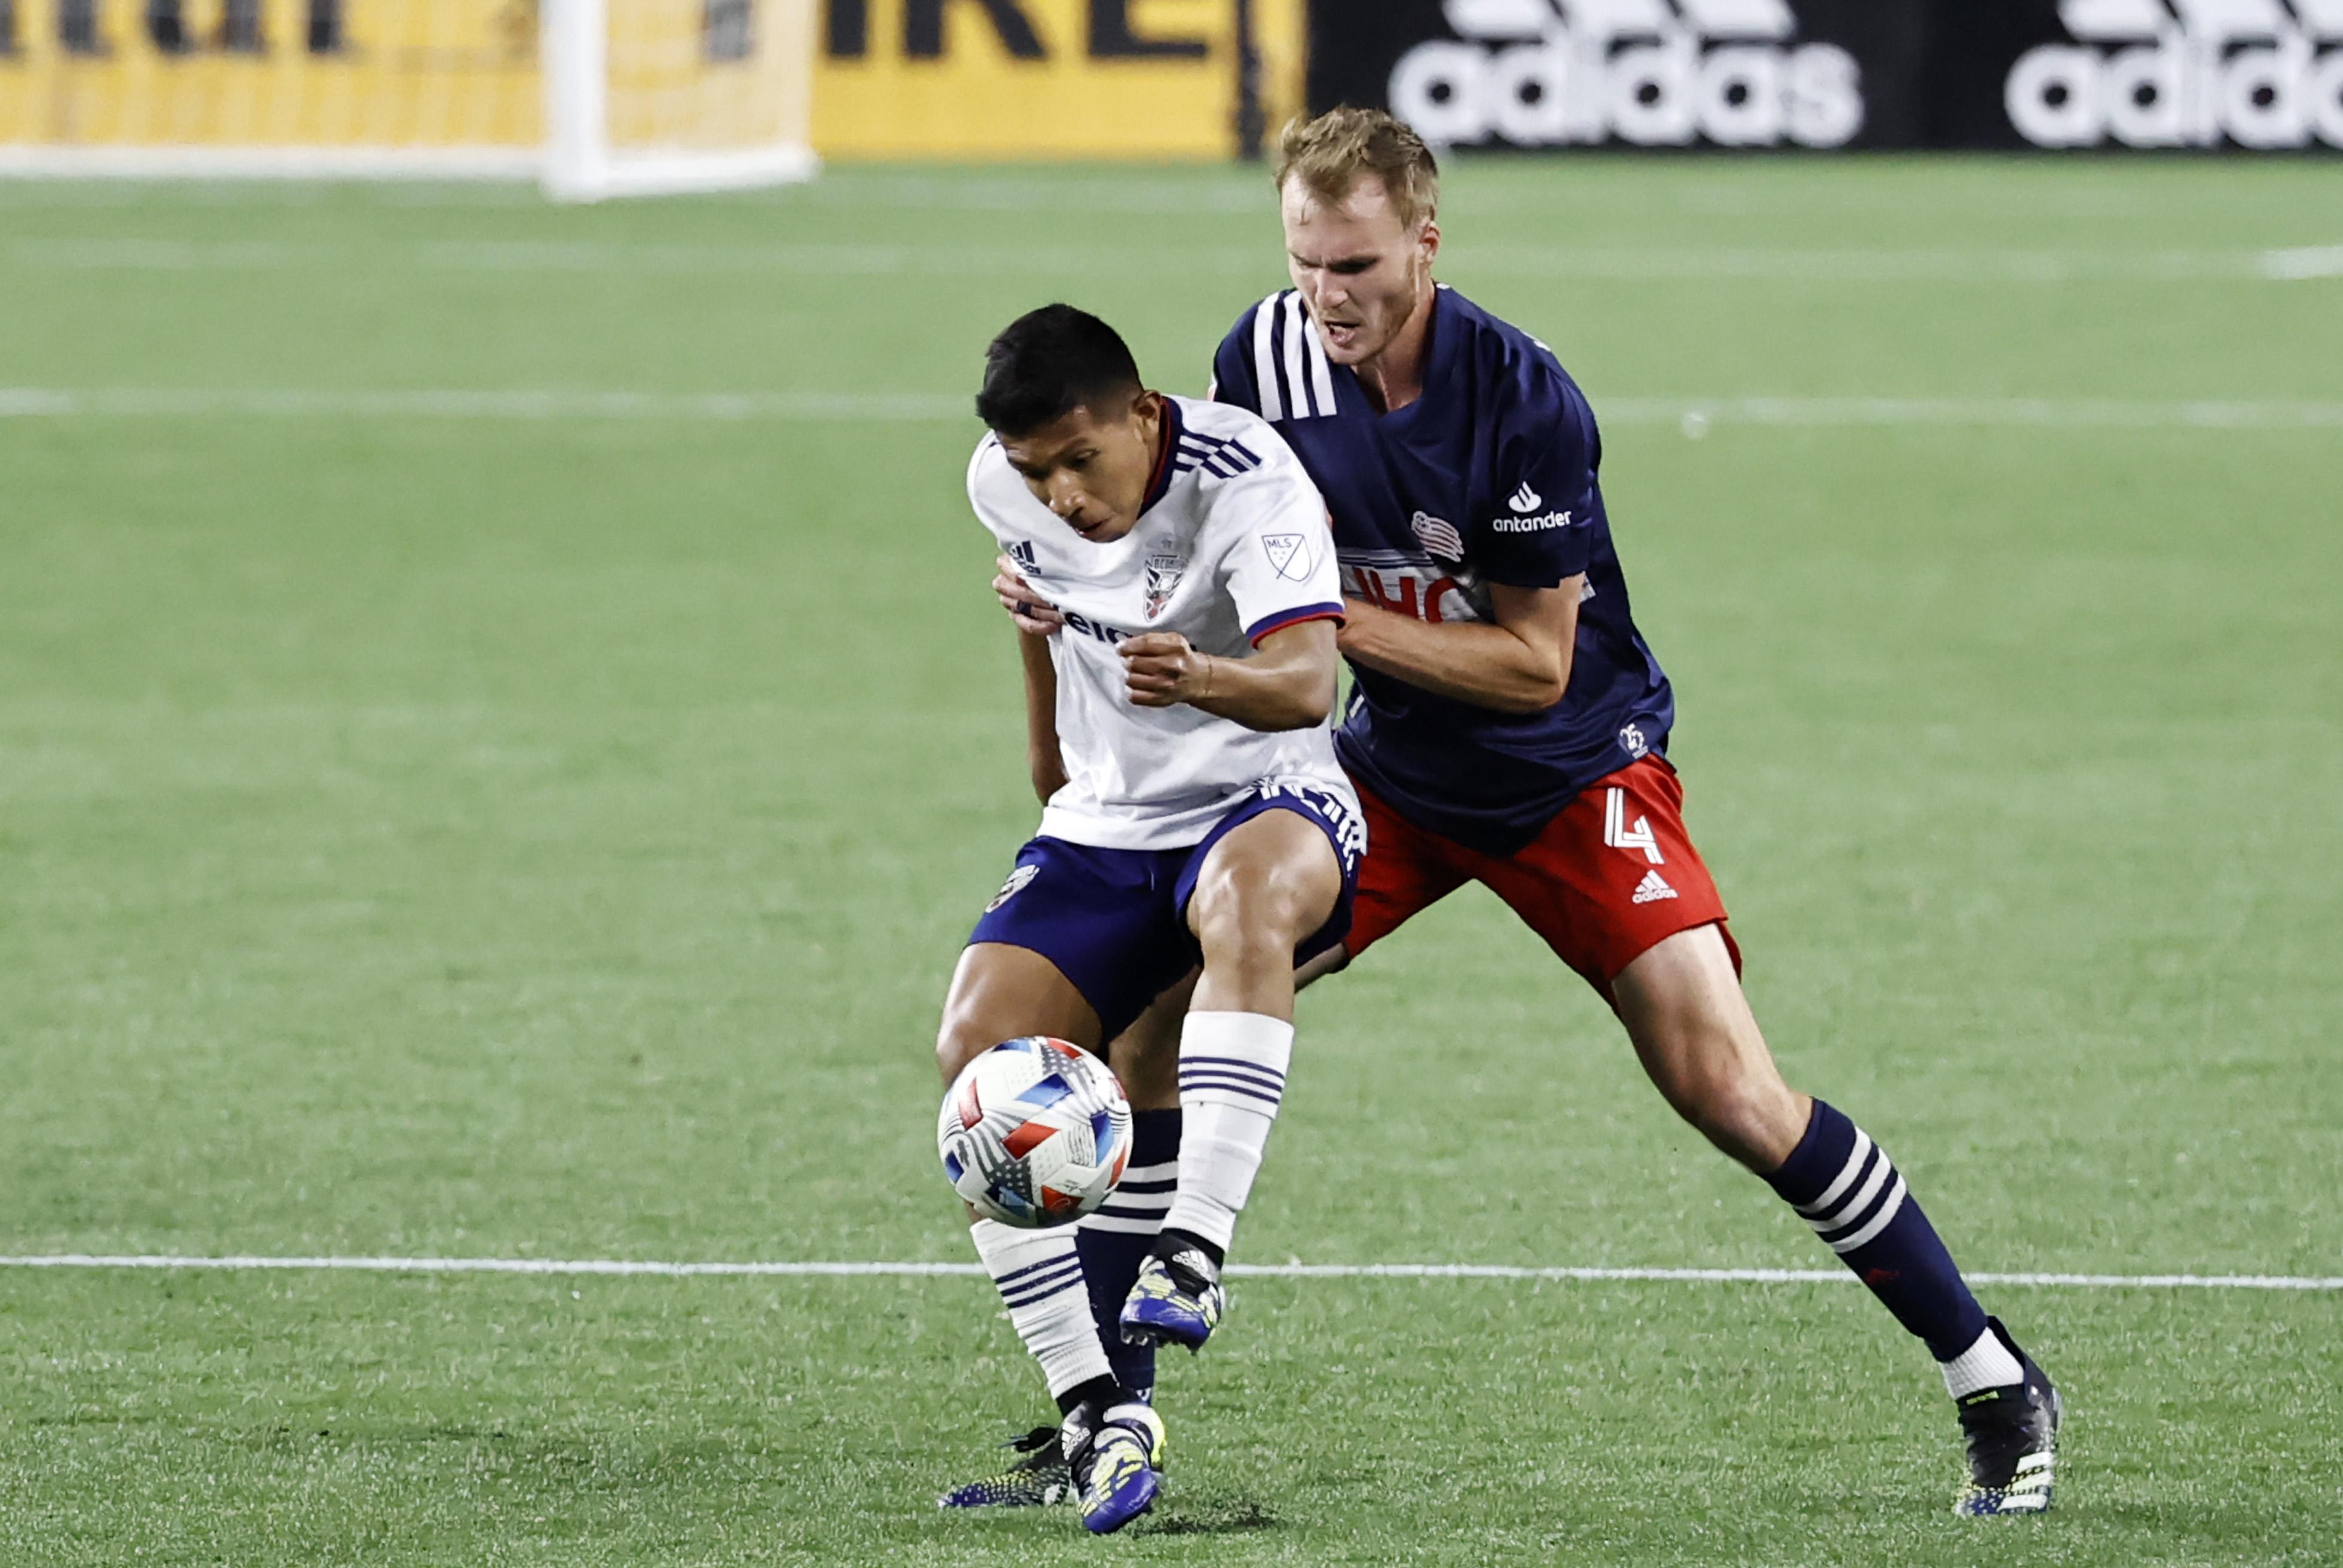 SOCCER: APR 24 MLS - DC United at New England Revolution